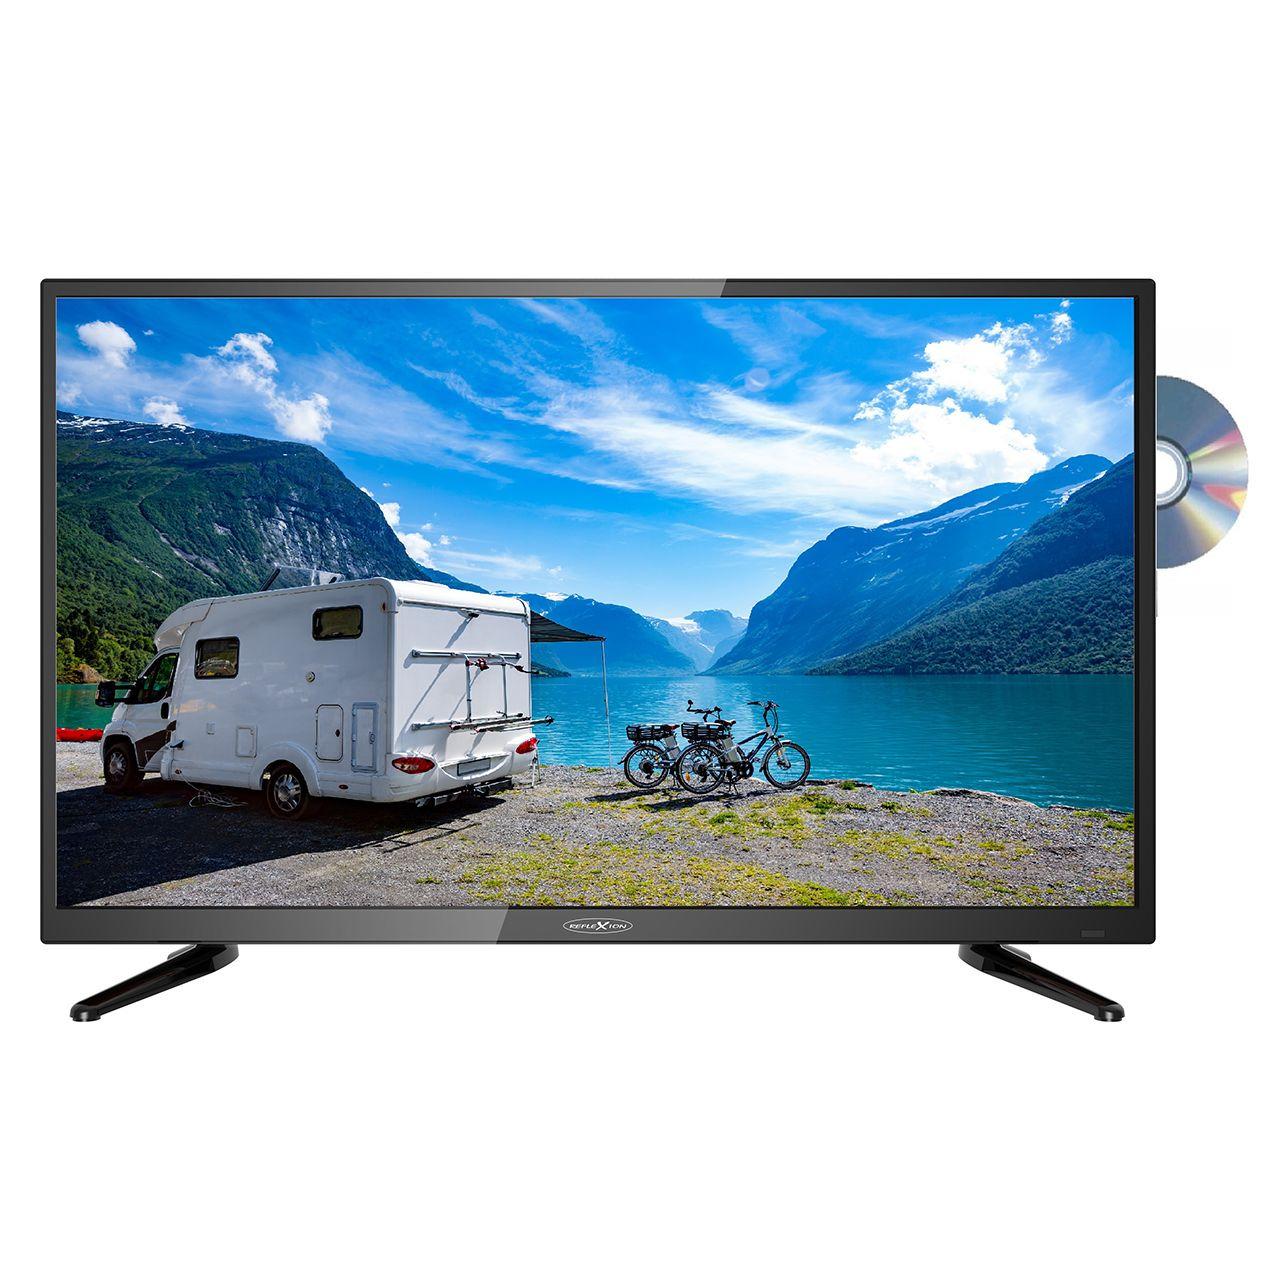 Reflexion 5-in-1-LED-TV LDDW320- 80 cm (32)- DVD-Player- DVB-S/S2/C/T/T2- H.265/HEVC- 12V